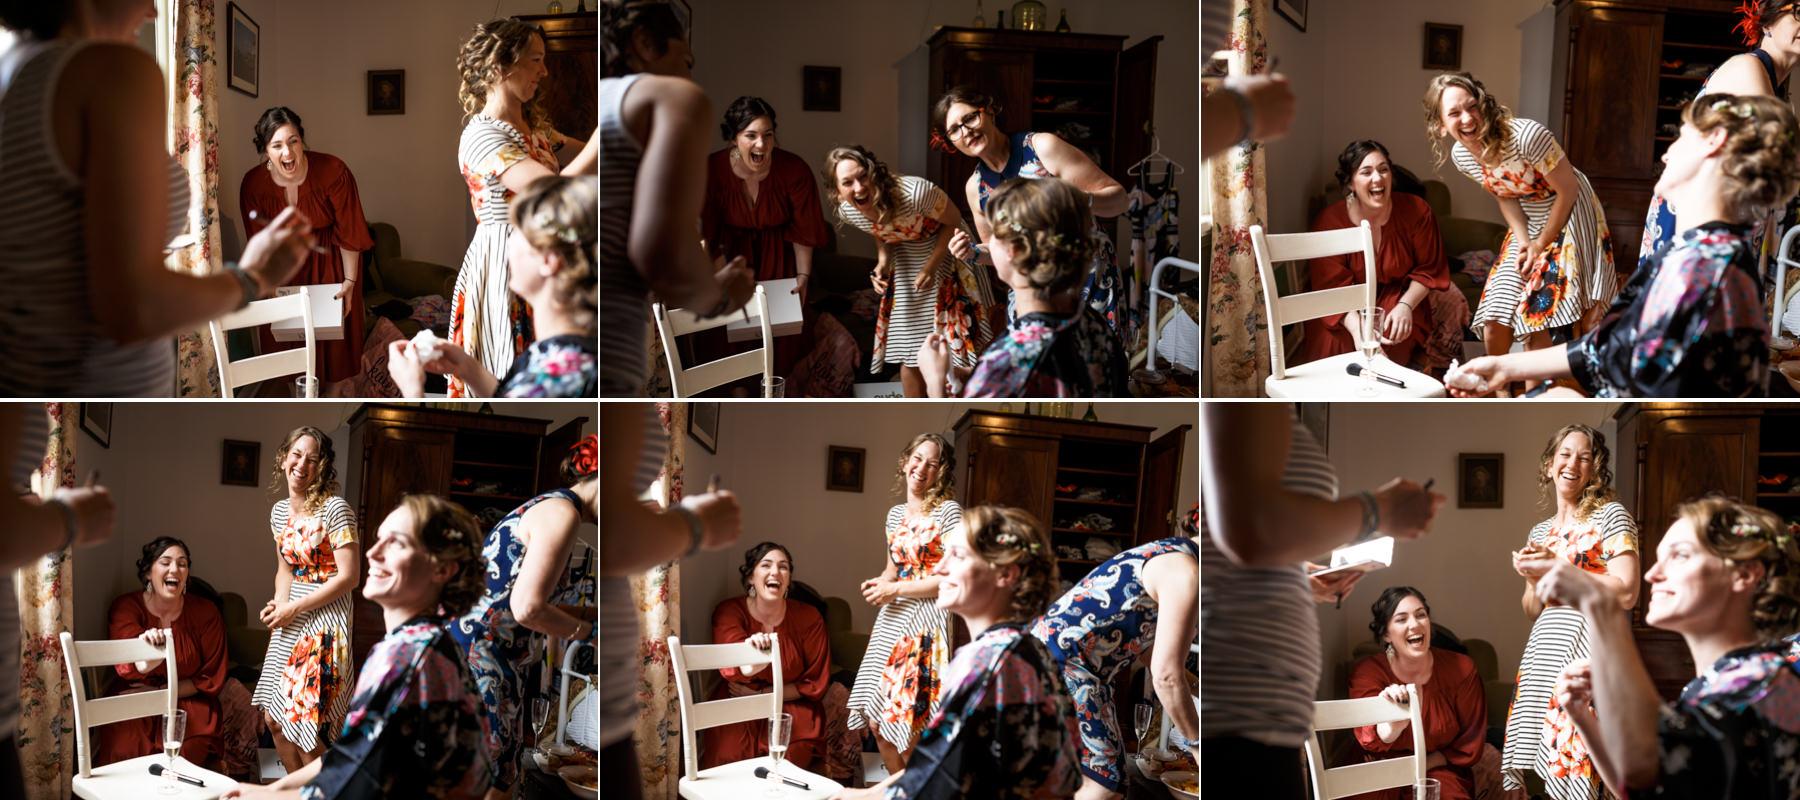 029 Rachel and James Slideshow-016.jpg